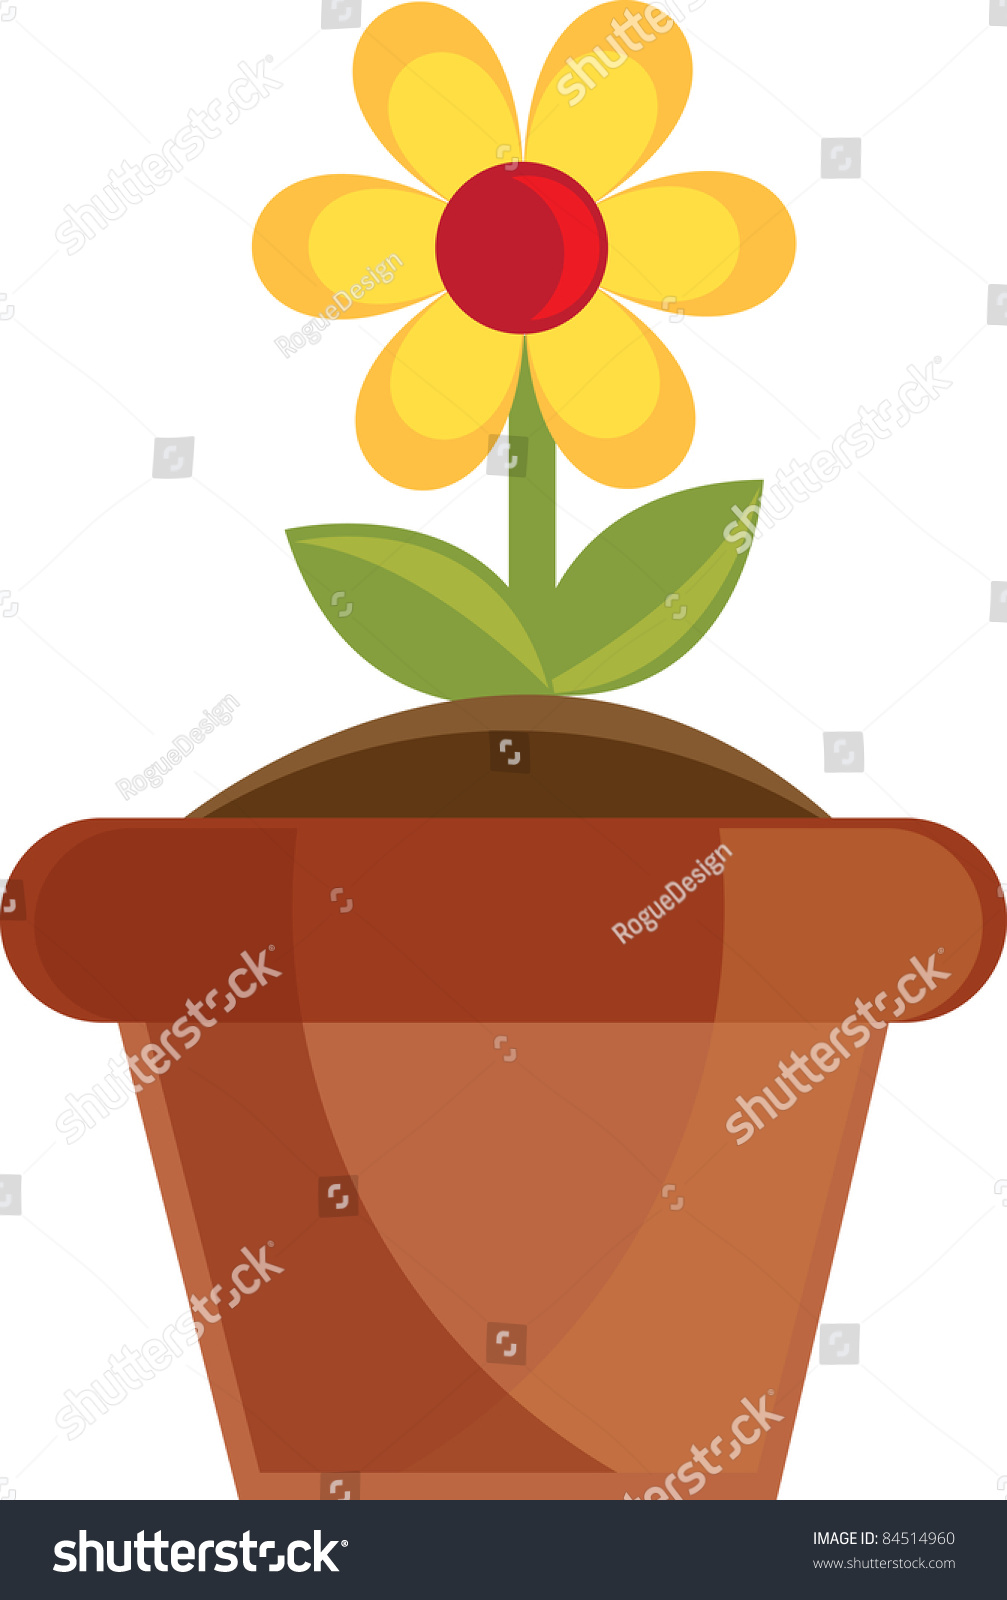 Clip art illustration yellow daisy flower stock illustration clip art illustration of a yellow daisy flower growing in a terra cotta pot izmirmasajfo